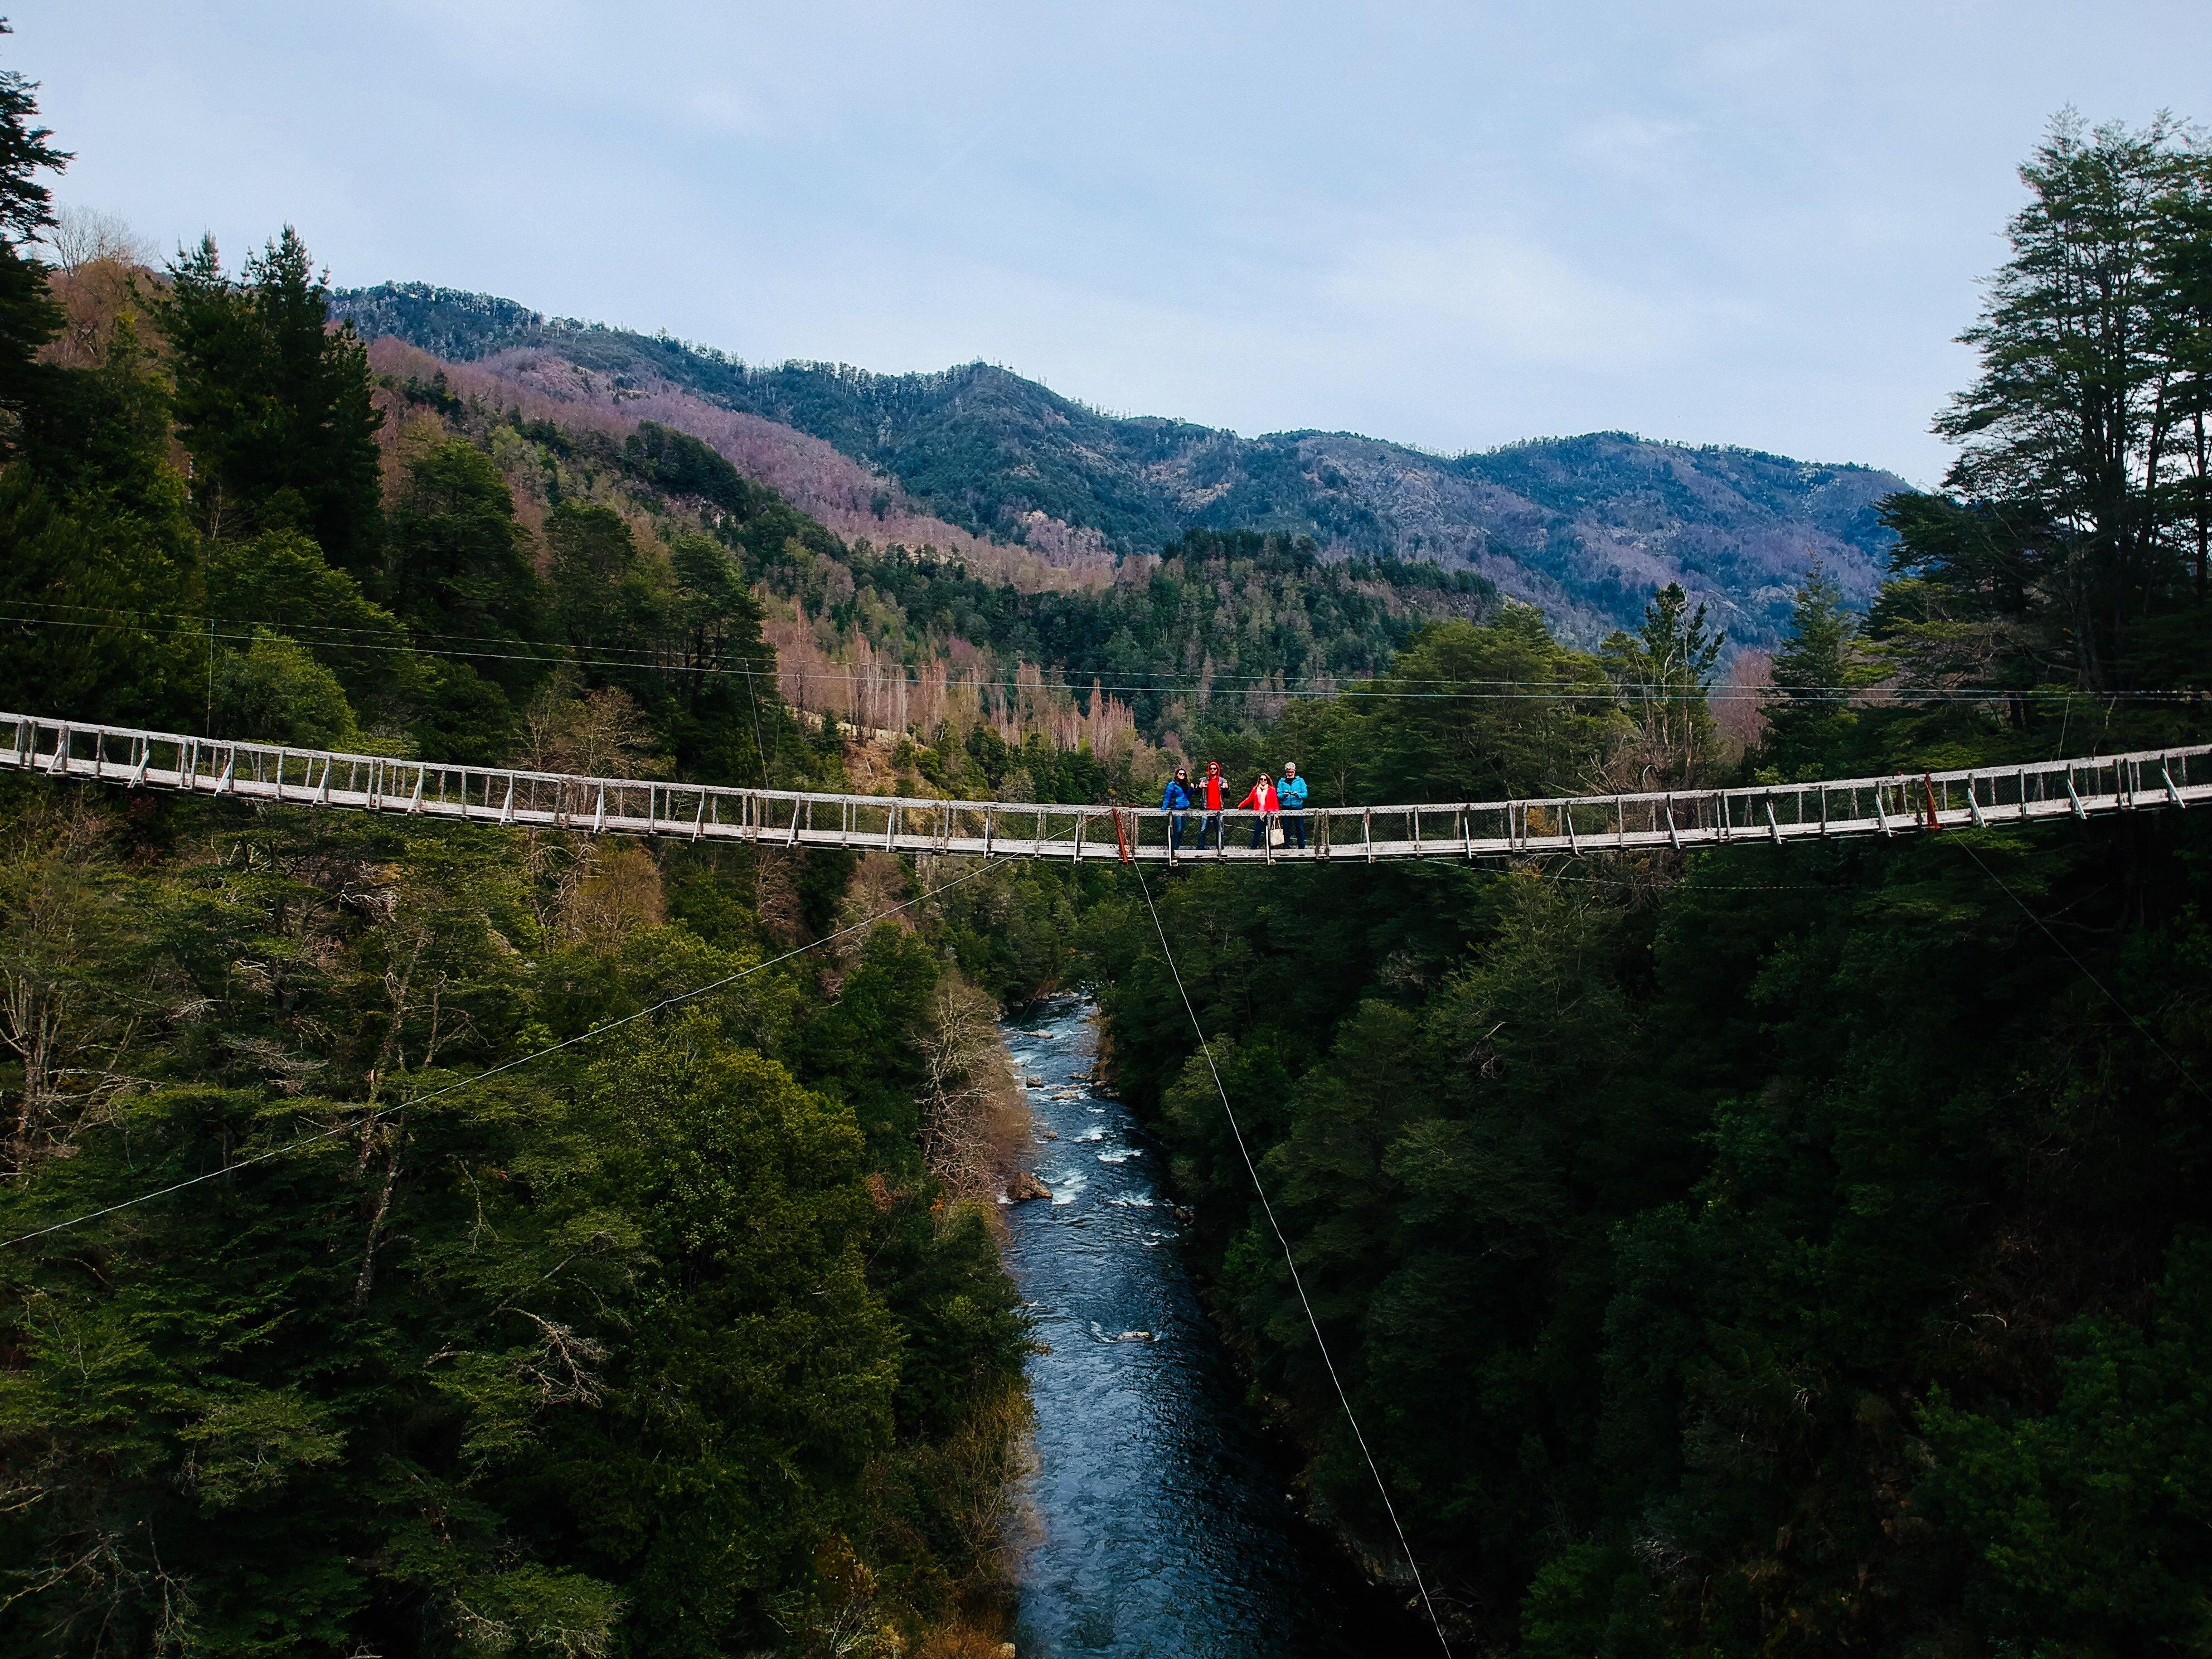 People Standing on Bridge, Bridge, Recreation, Water, Trees, HQ Photo